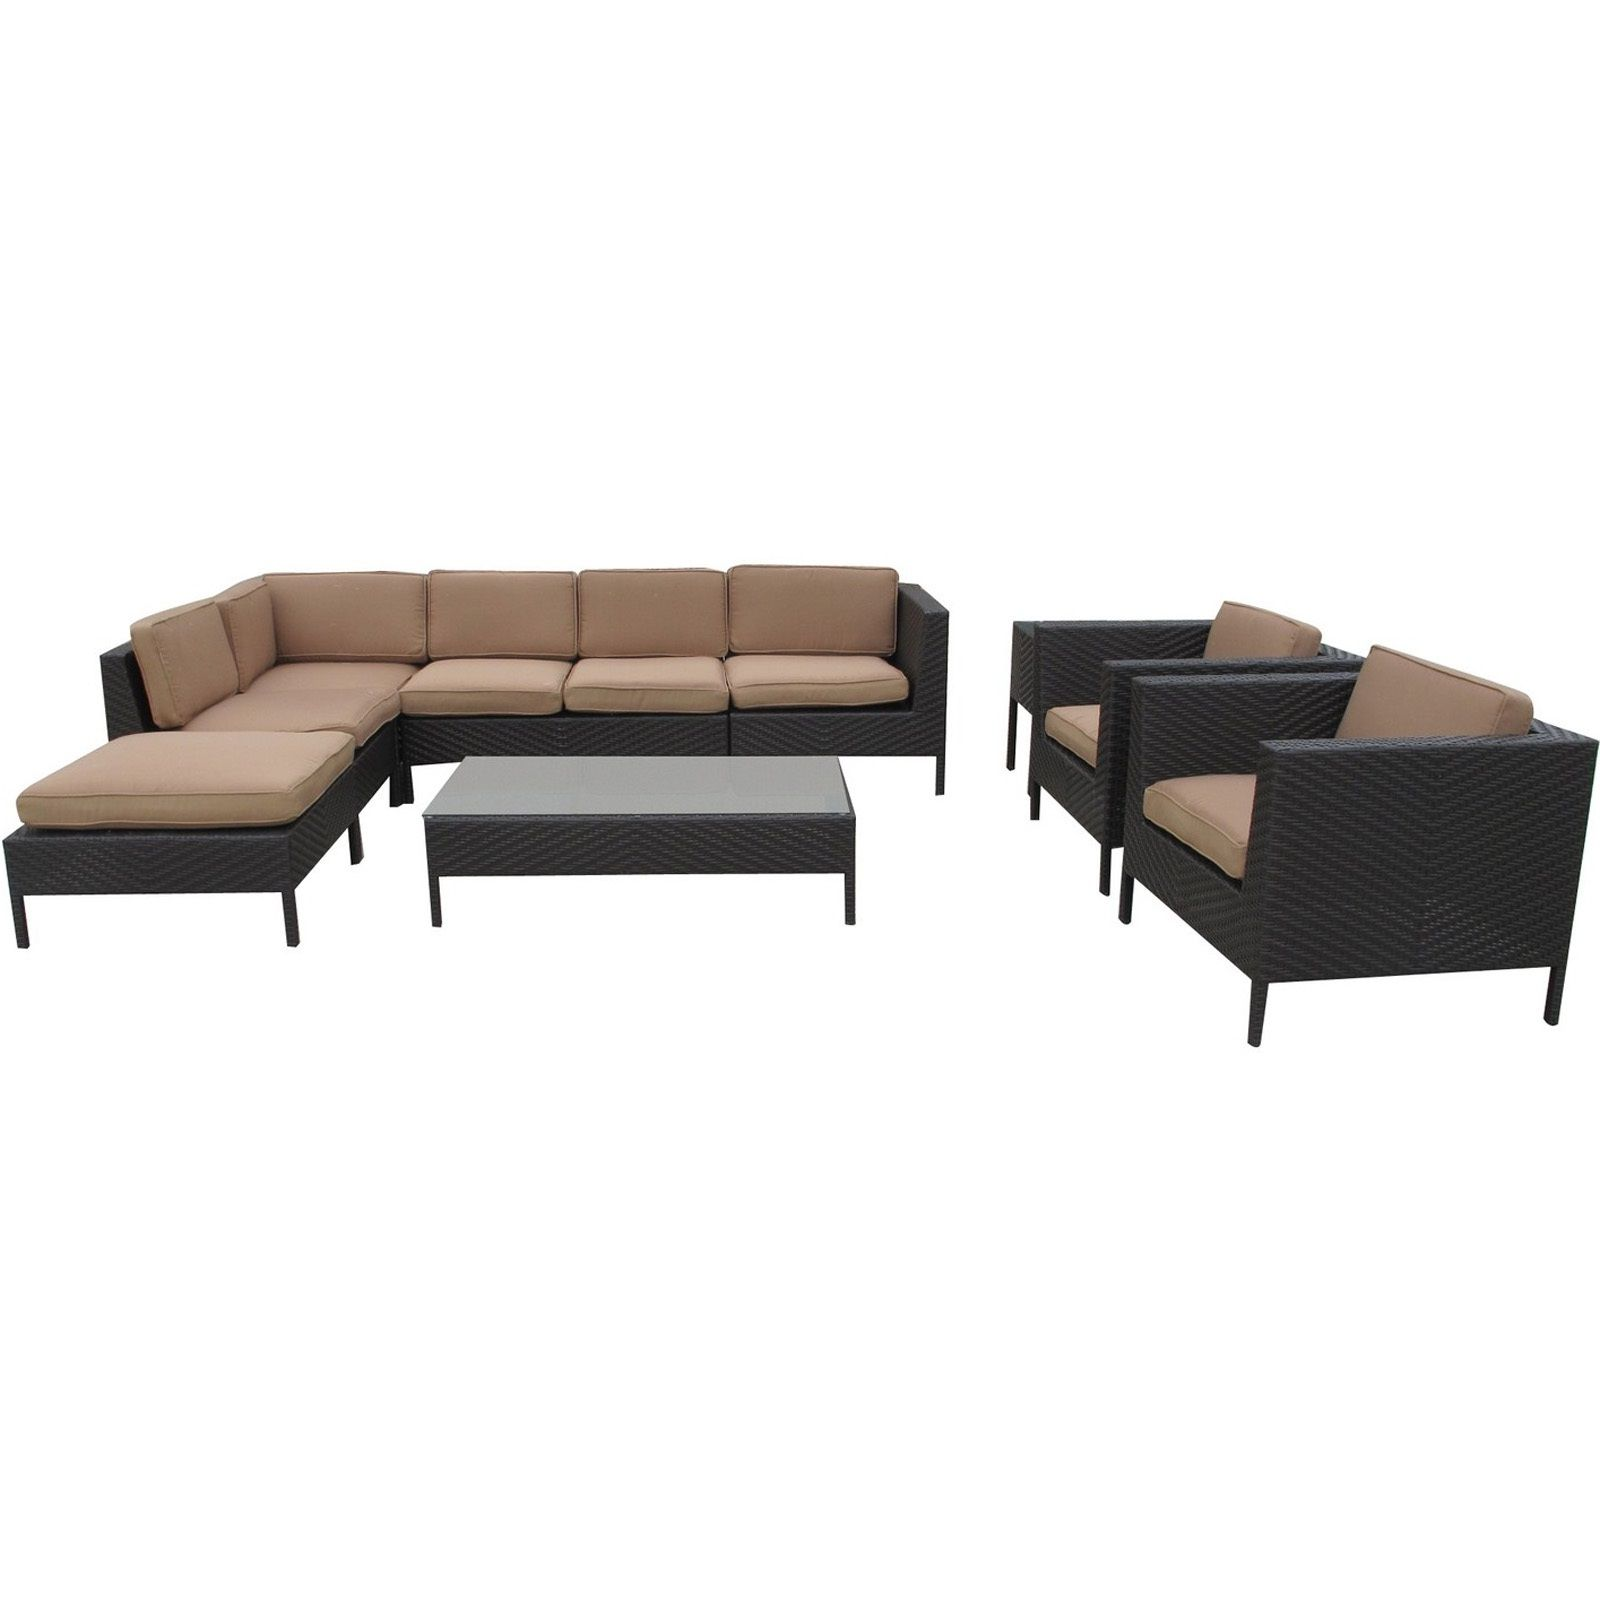 La Jolla Outdoor Wicker Patio 9 Piece Sectional Sofa Set in